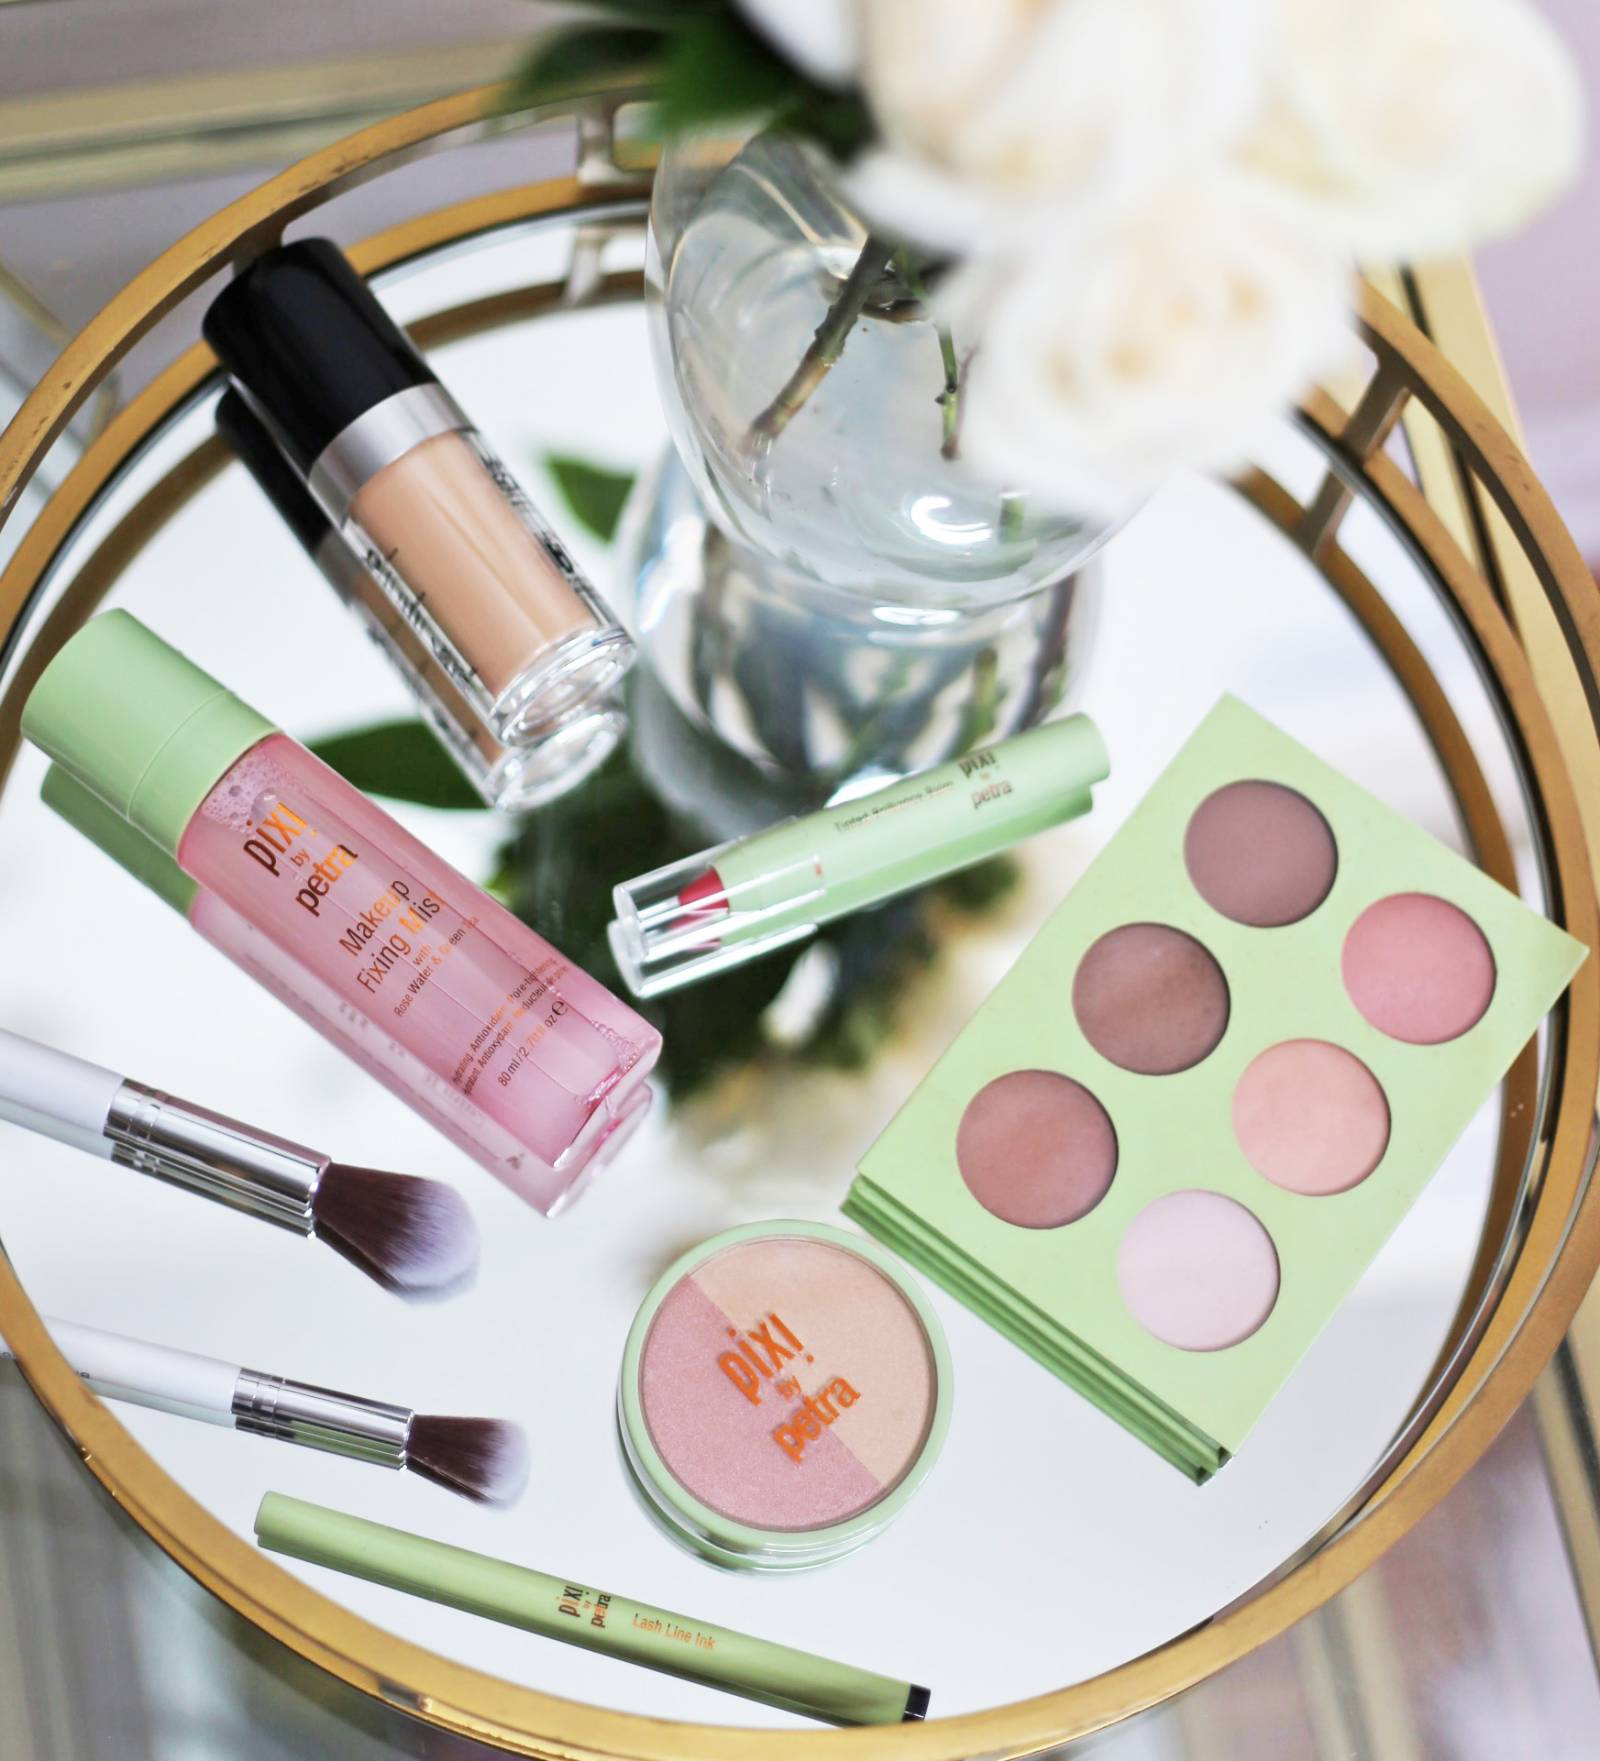 date night makeup tutorial drugstore makeup | Mash Elle beauty blogger | makeup for dates | Pixi Makeup | makeup tutorial